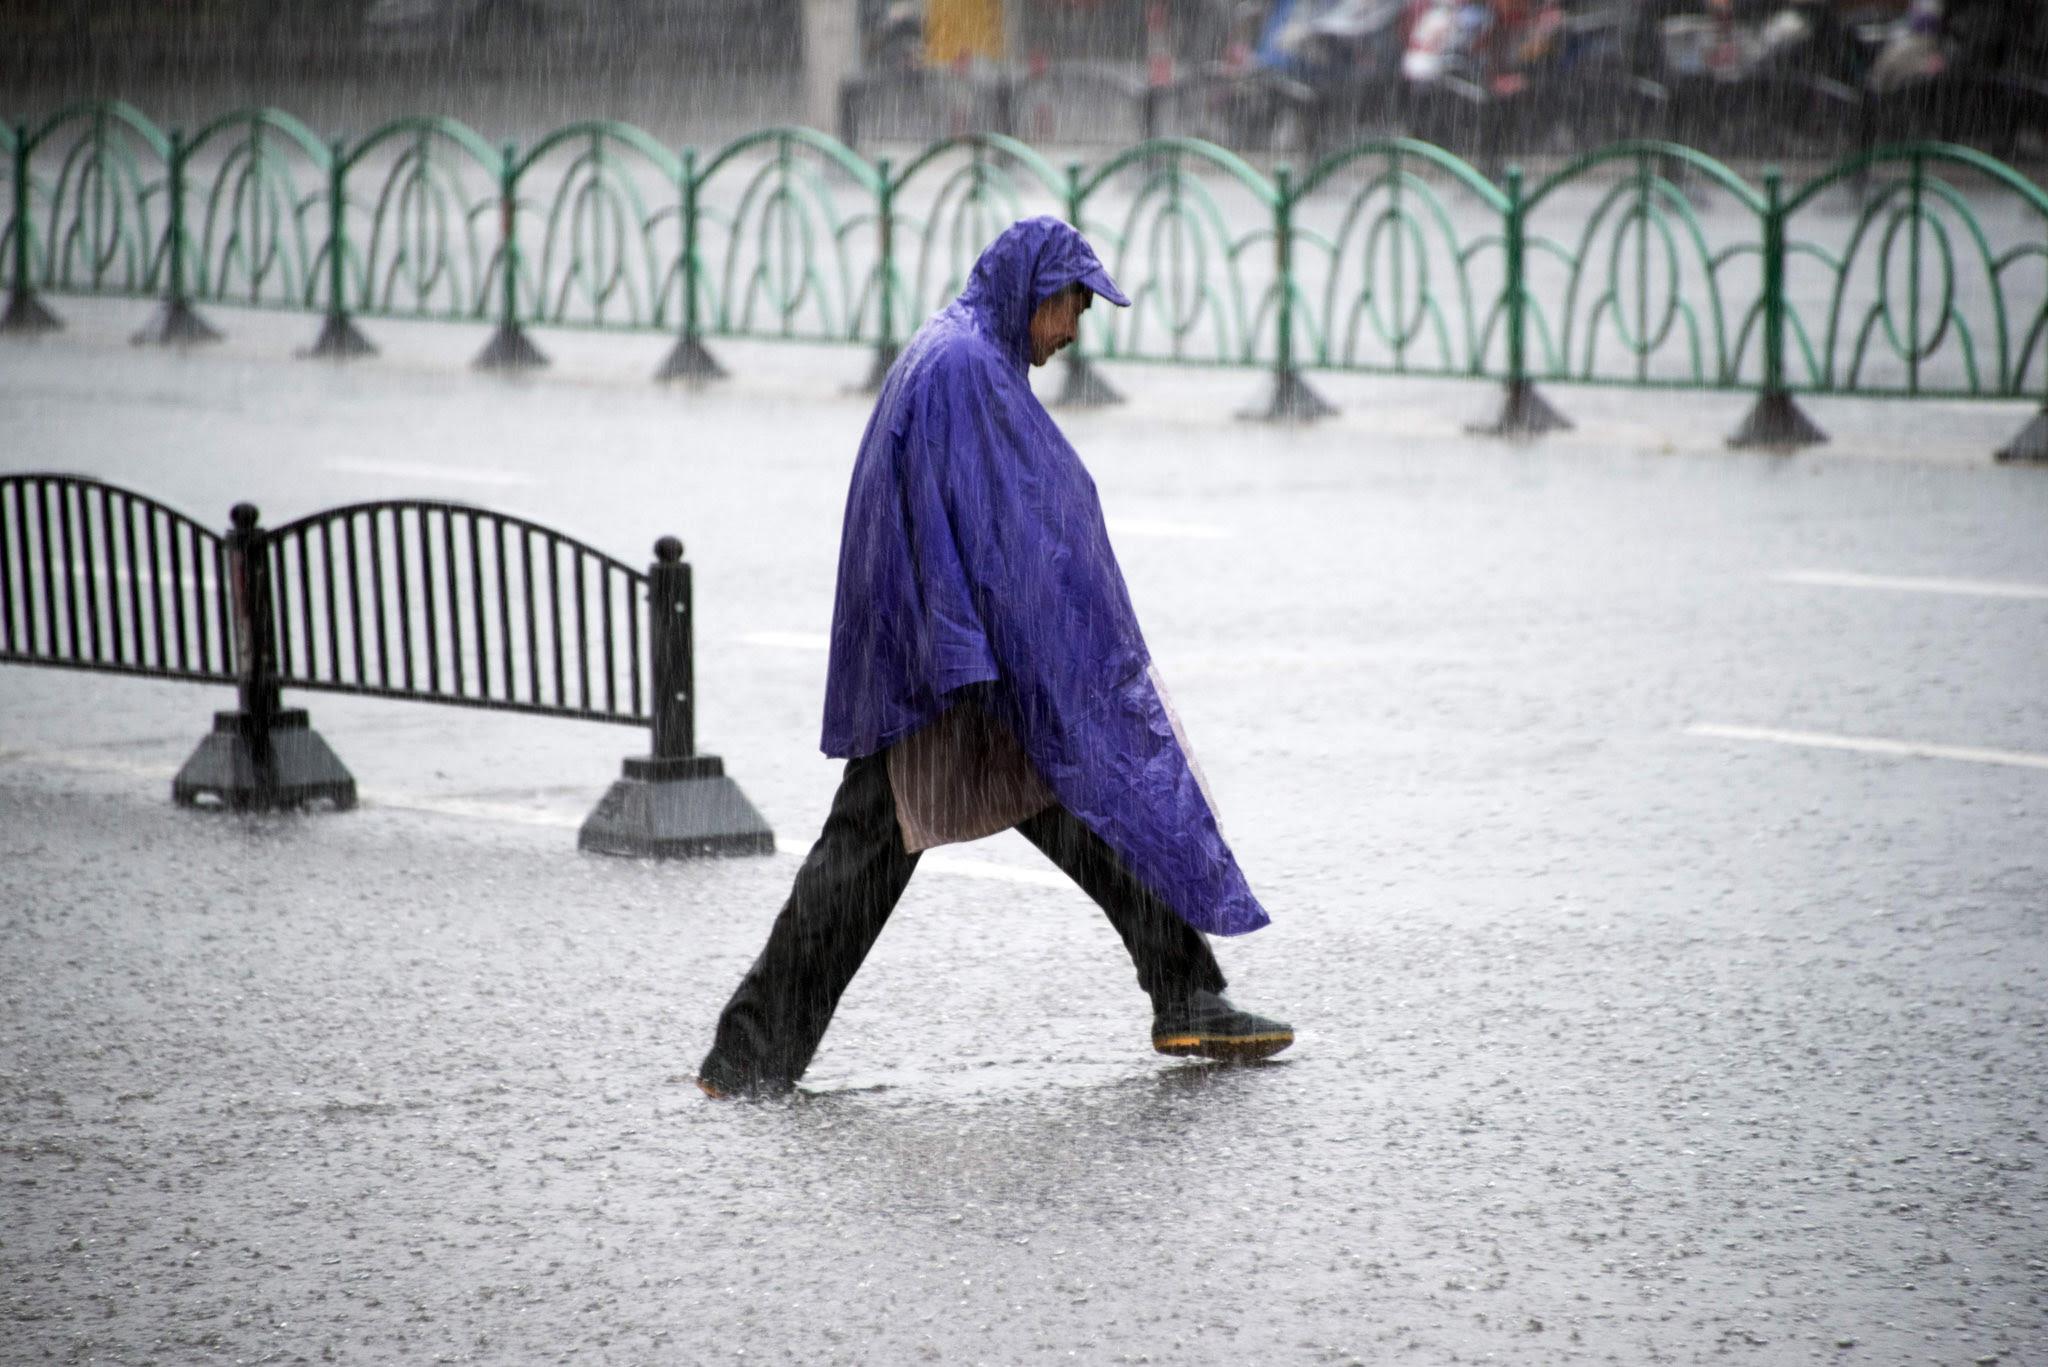 A man crosses a flooded street during rainfall in Shanghai